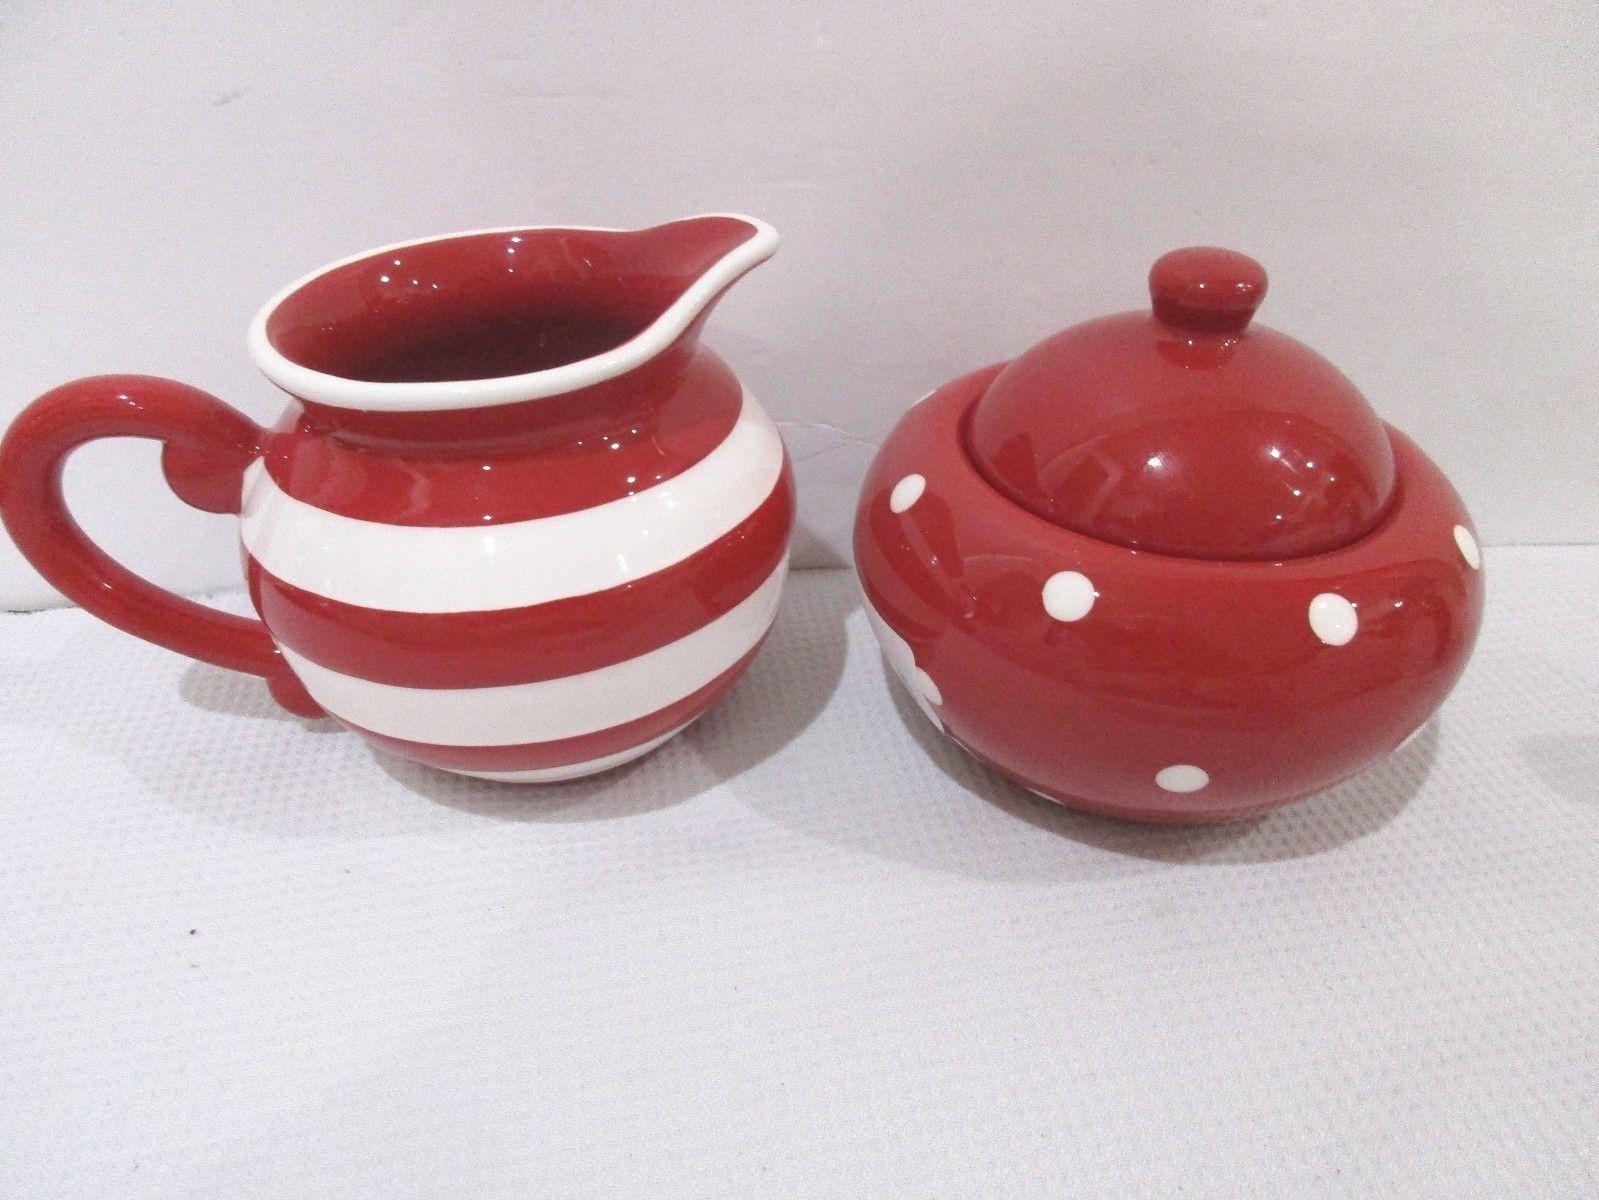 Home & Garden Dinnerware & Serving Dishes New Terramoto Ceramic ...